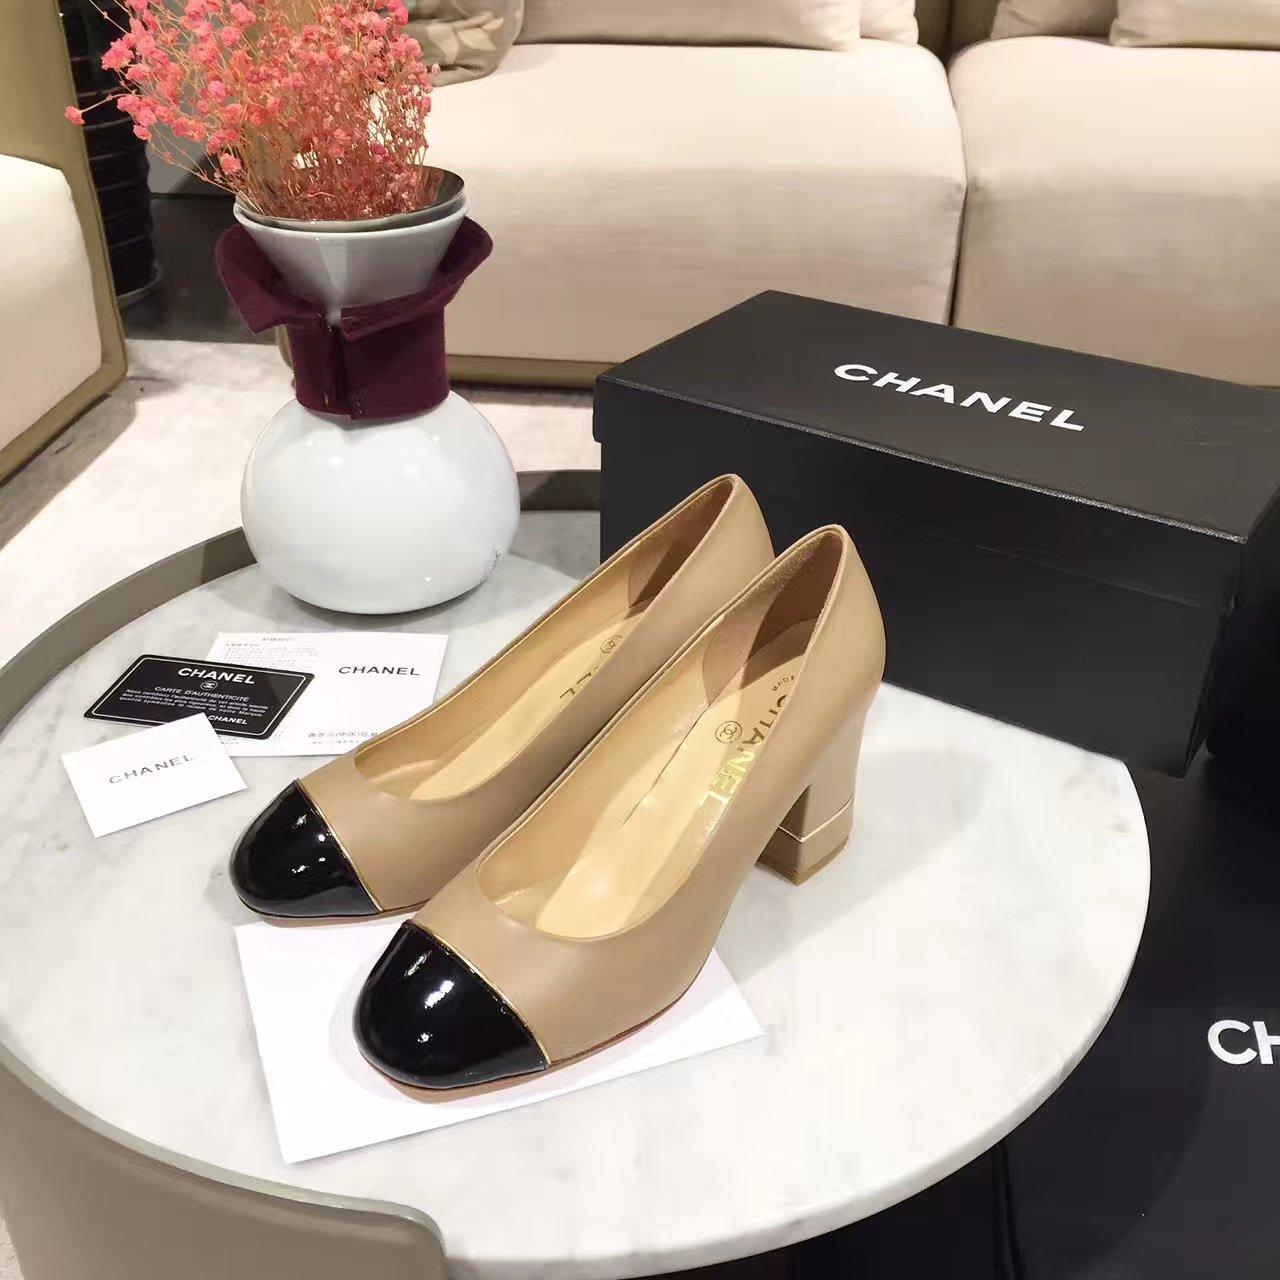 CHANEL女鞋_香奈儿圆头粗跟单鞋是永不落幕的经典